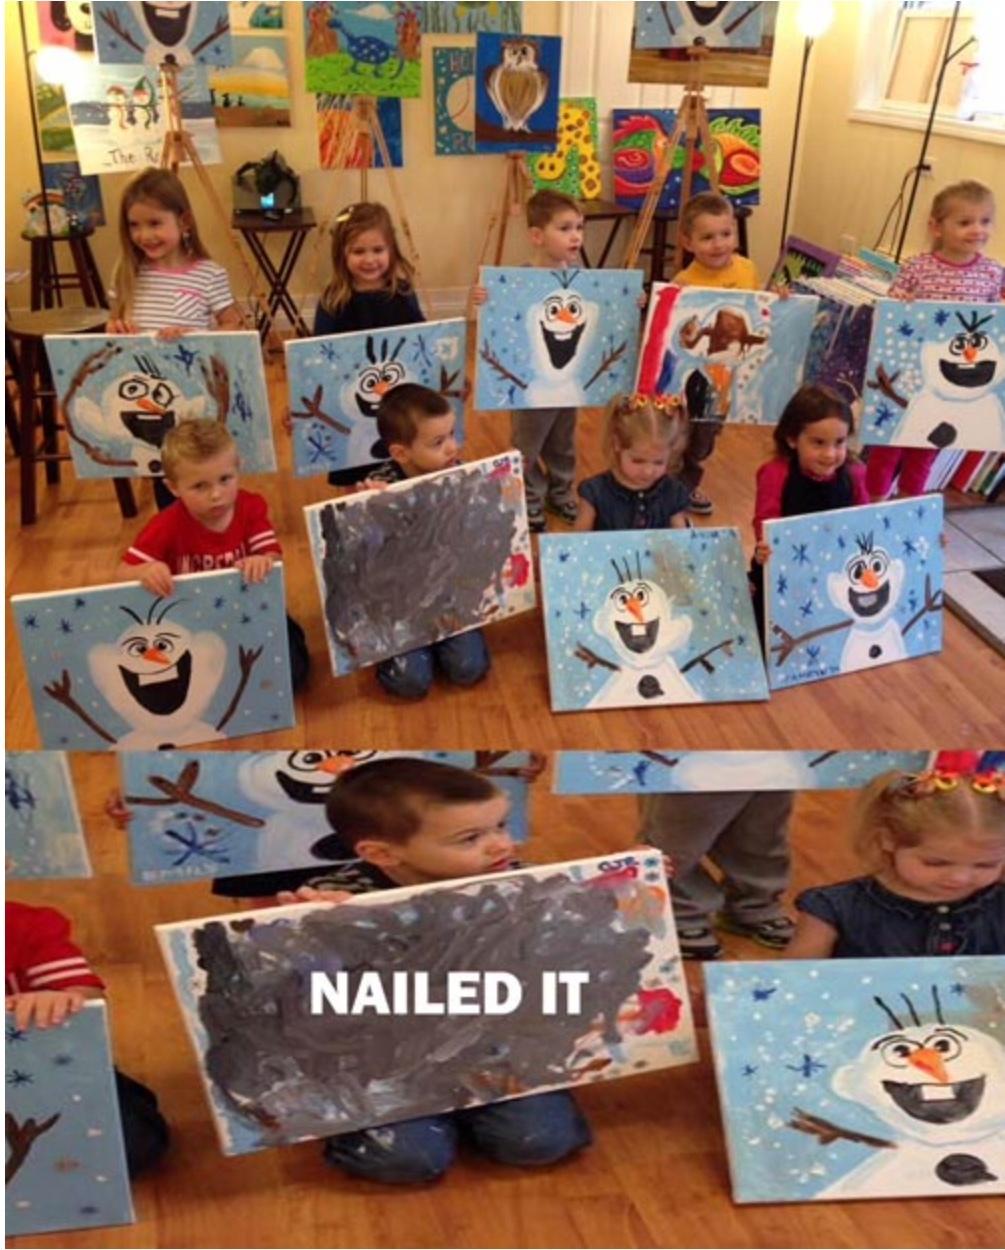 Nailed it - meme